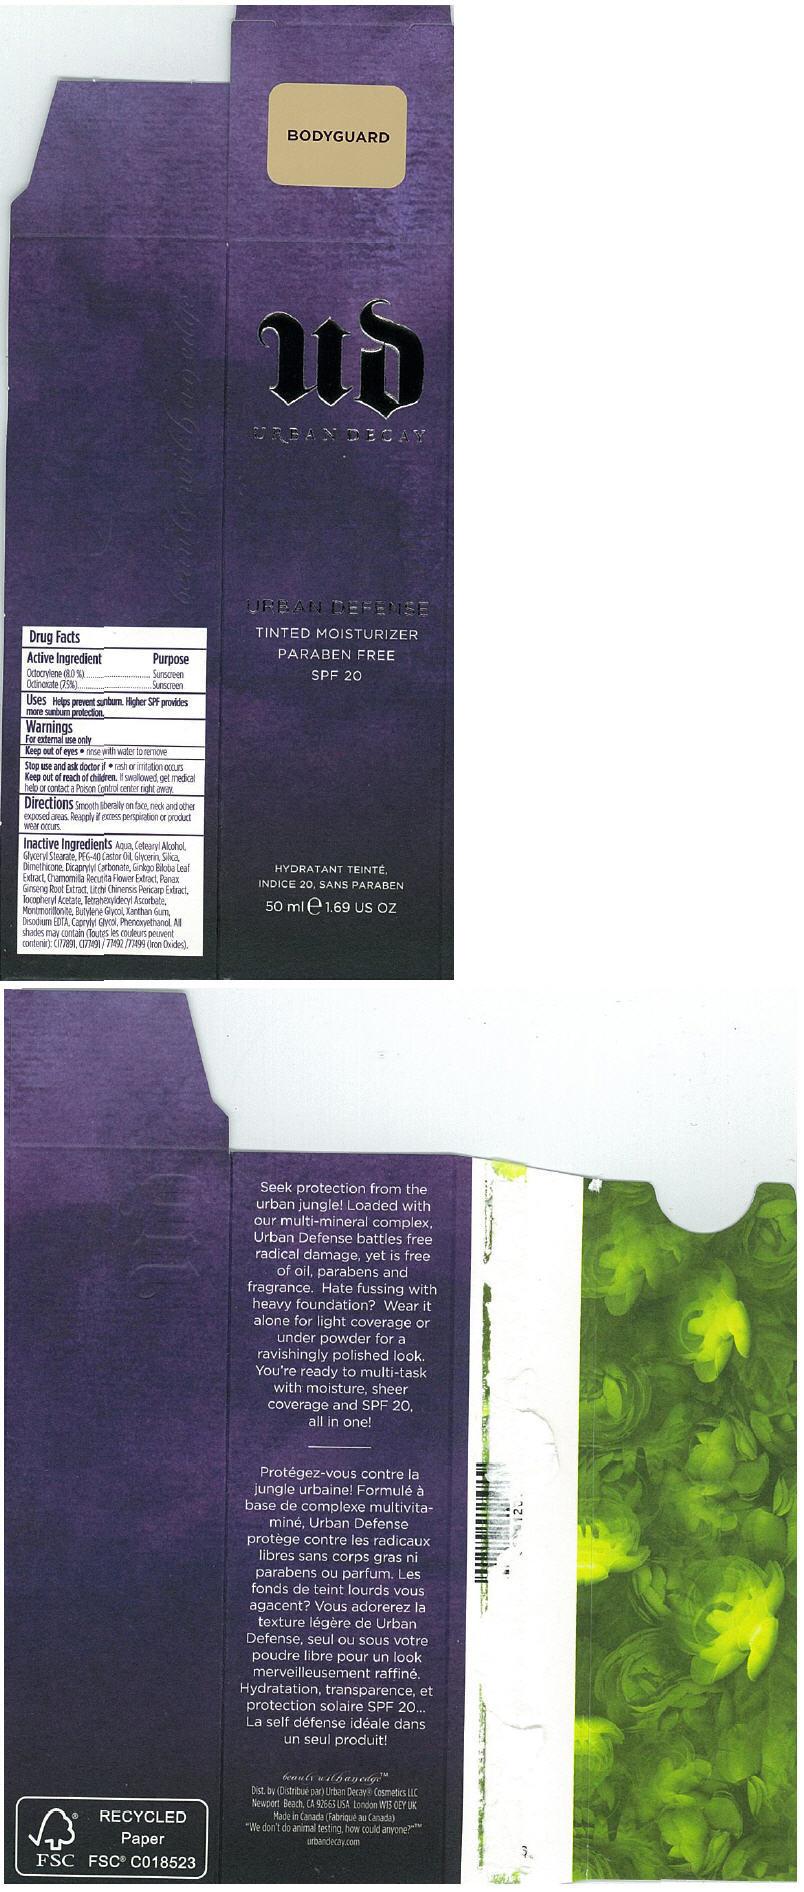 Urban Defense (Octocrylene And Octinoxate) Emulsion [Urban Decay Cosmetics, Llc]